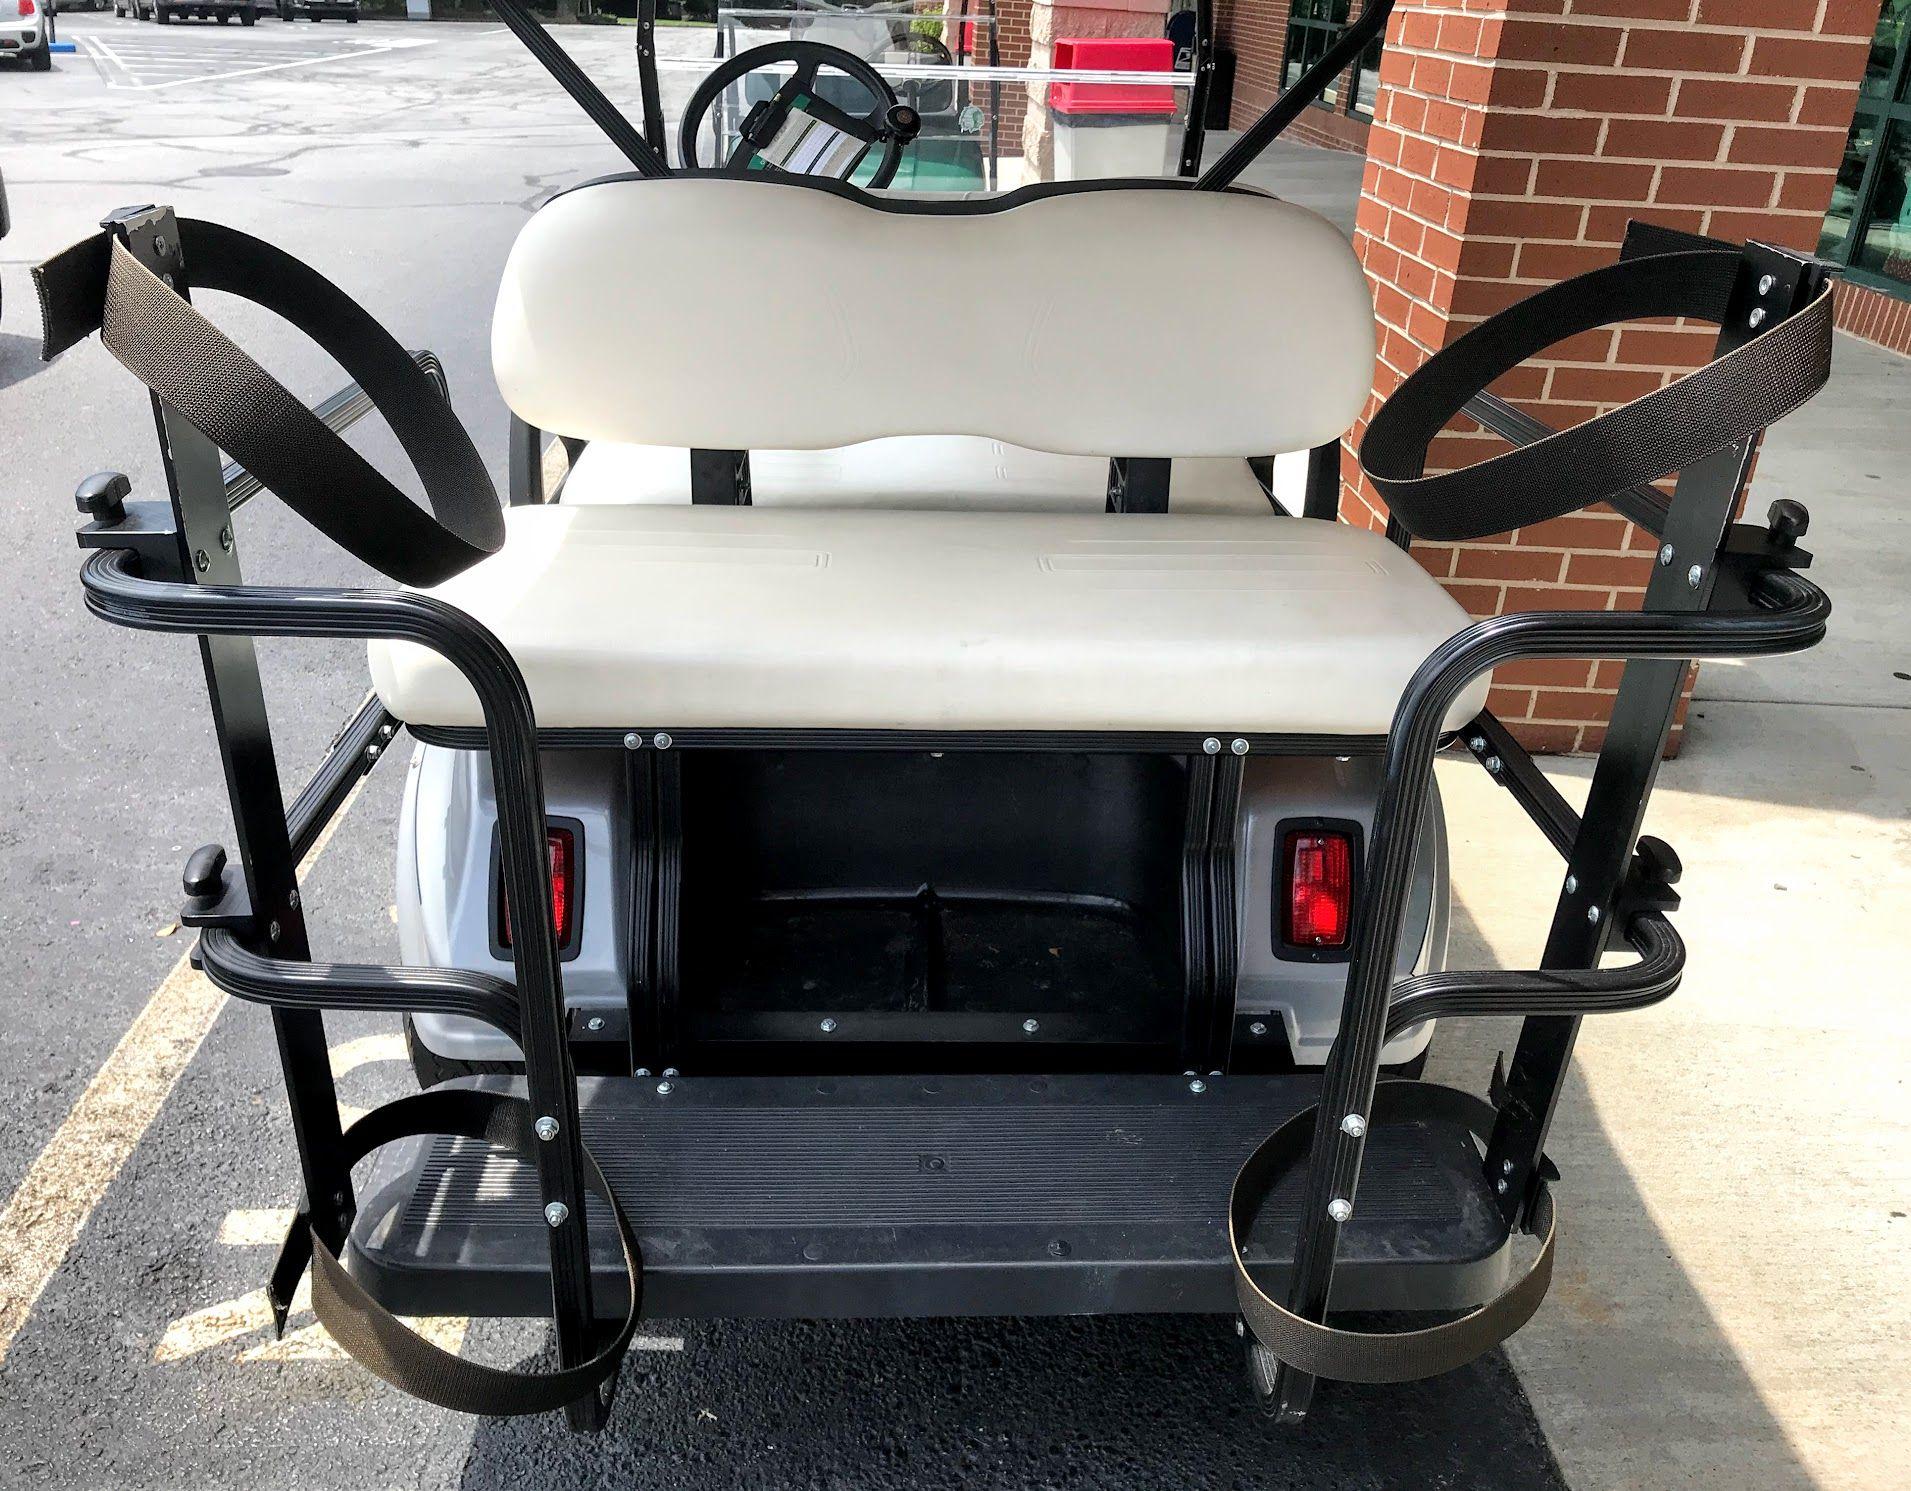 Rear Seat Golf Bag Rack Golf Bags Club Car Golf Cart Golf Cart Accessories